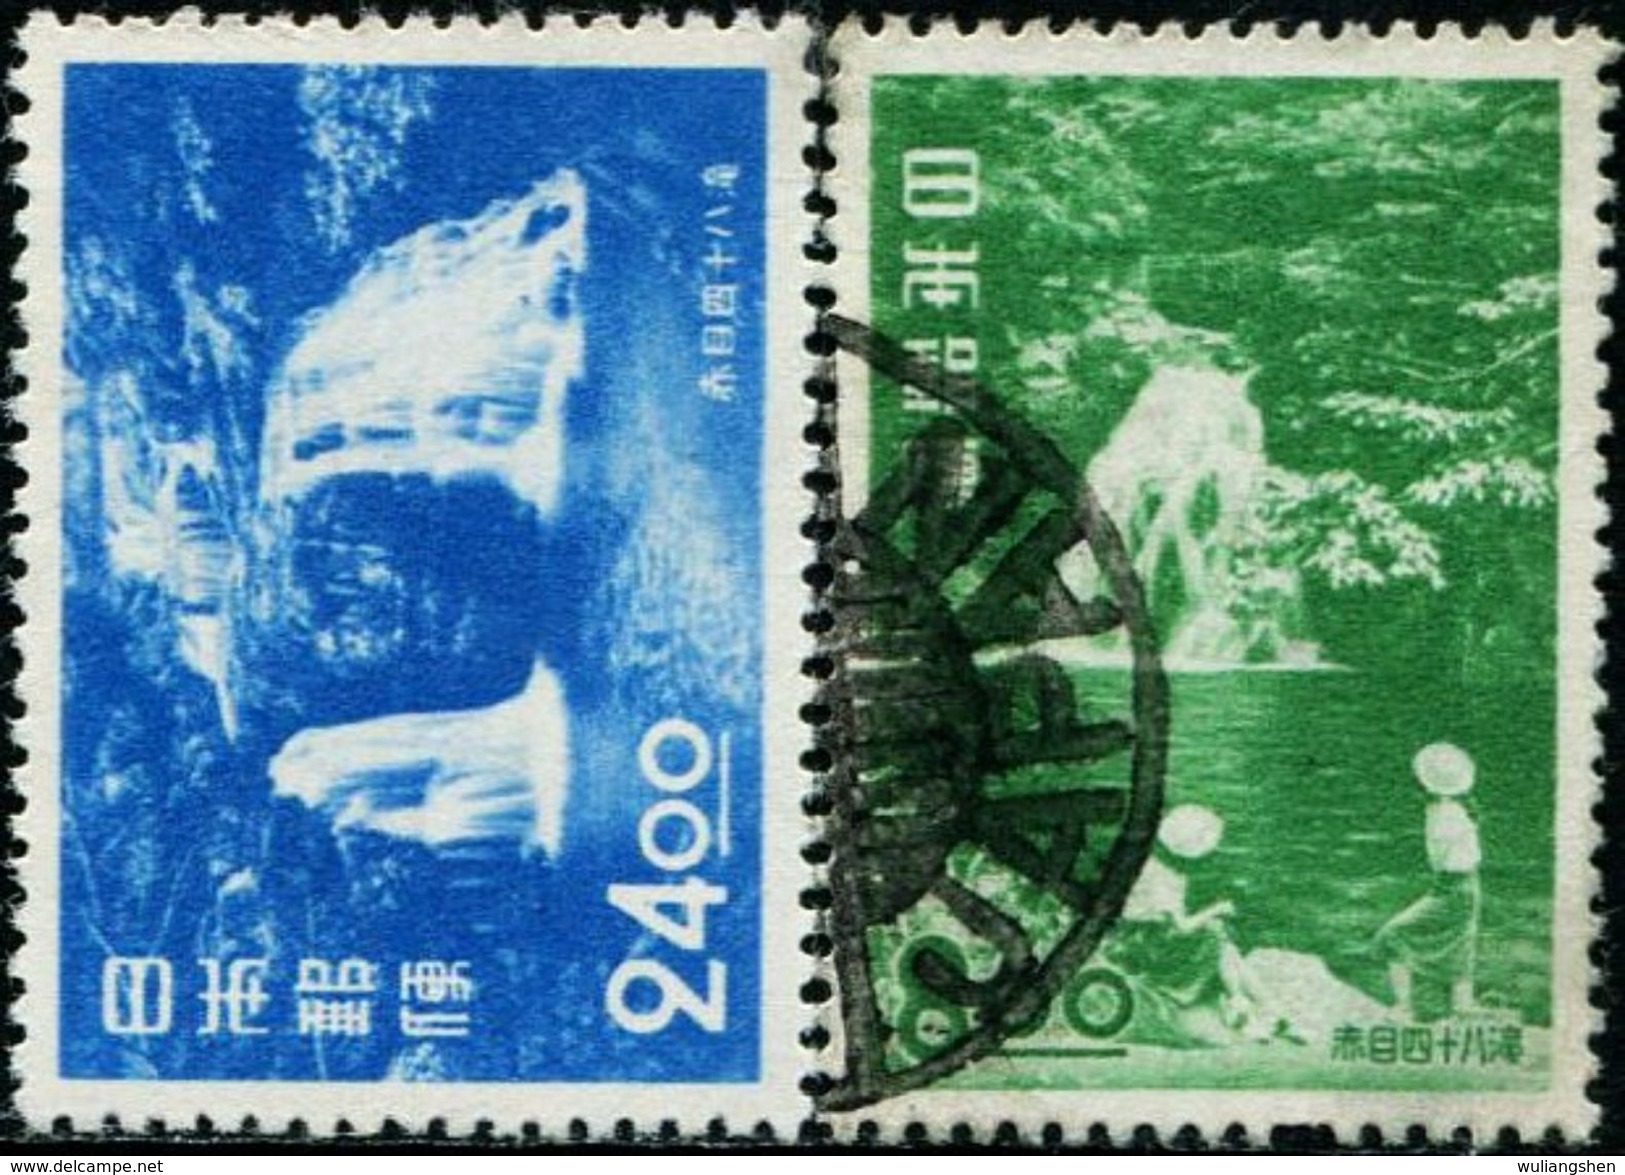 NP1025 Japan 1951 Waterfall Scenery 2V MNH - 1989-... Emperor Akihito (Heisei Era)